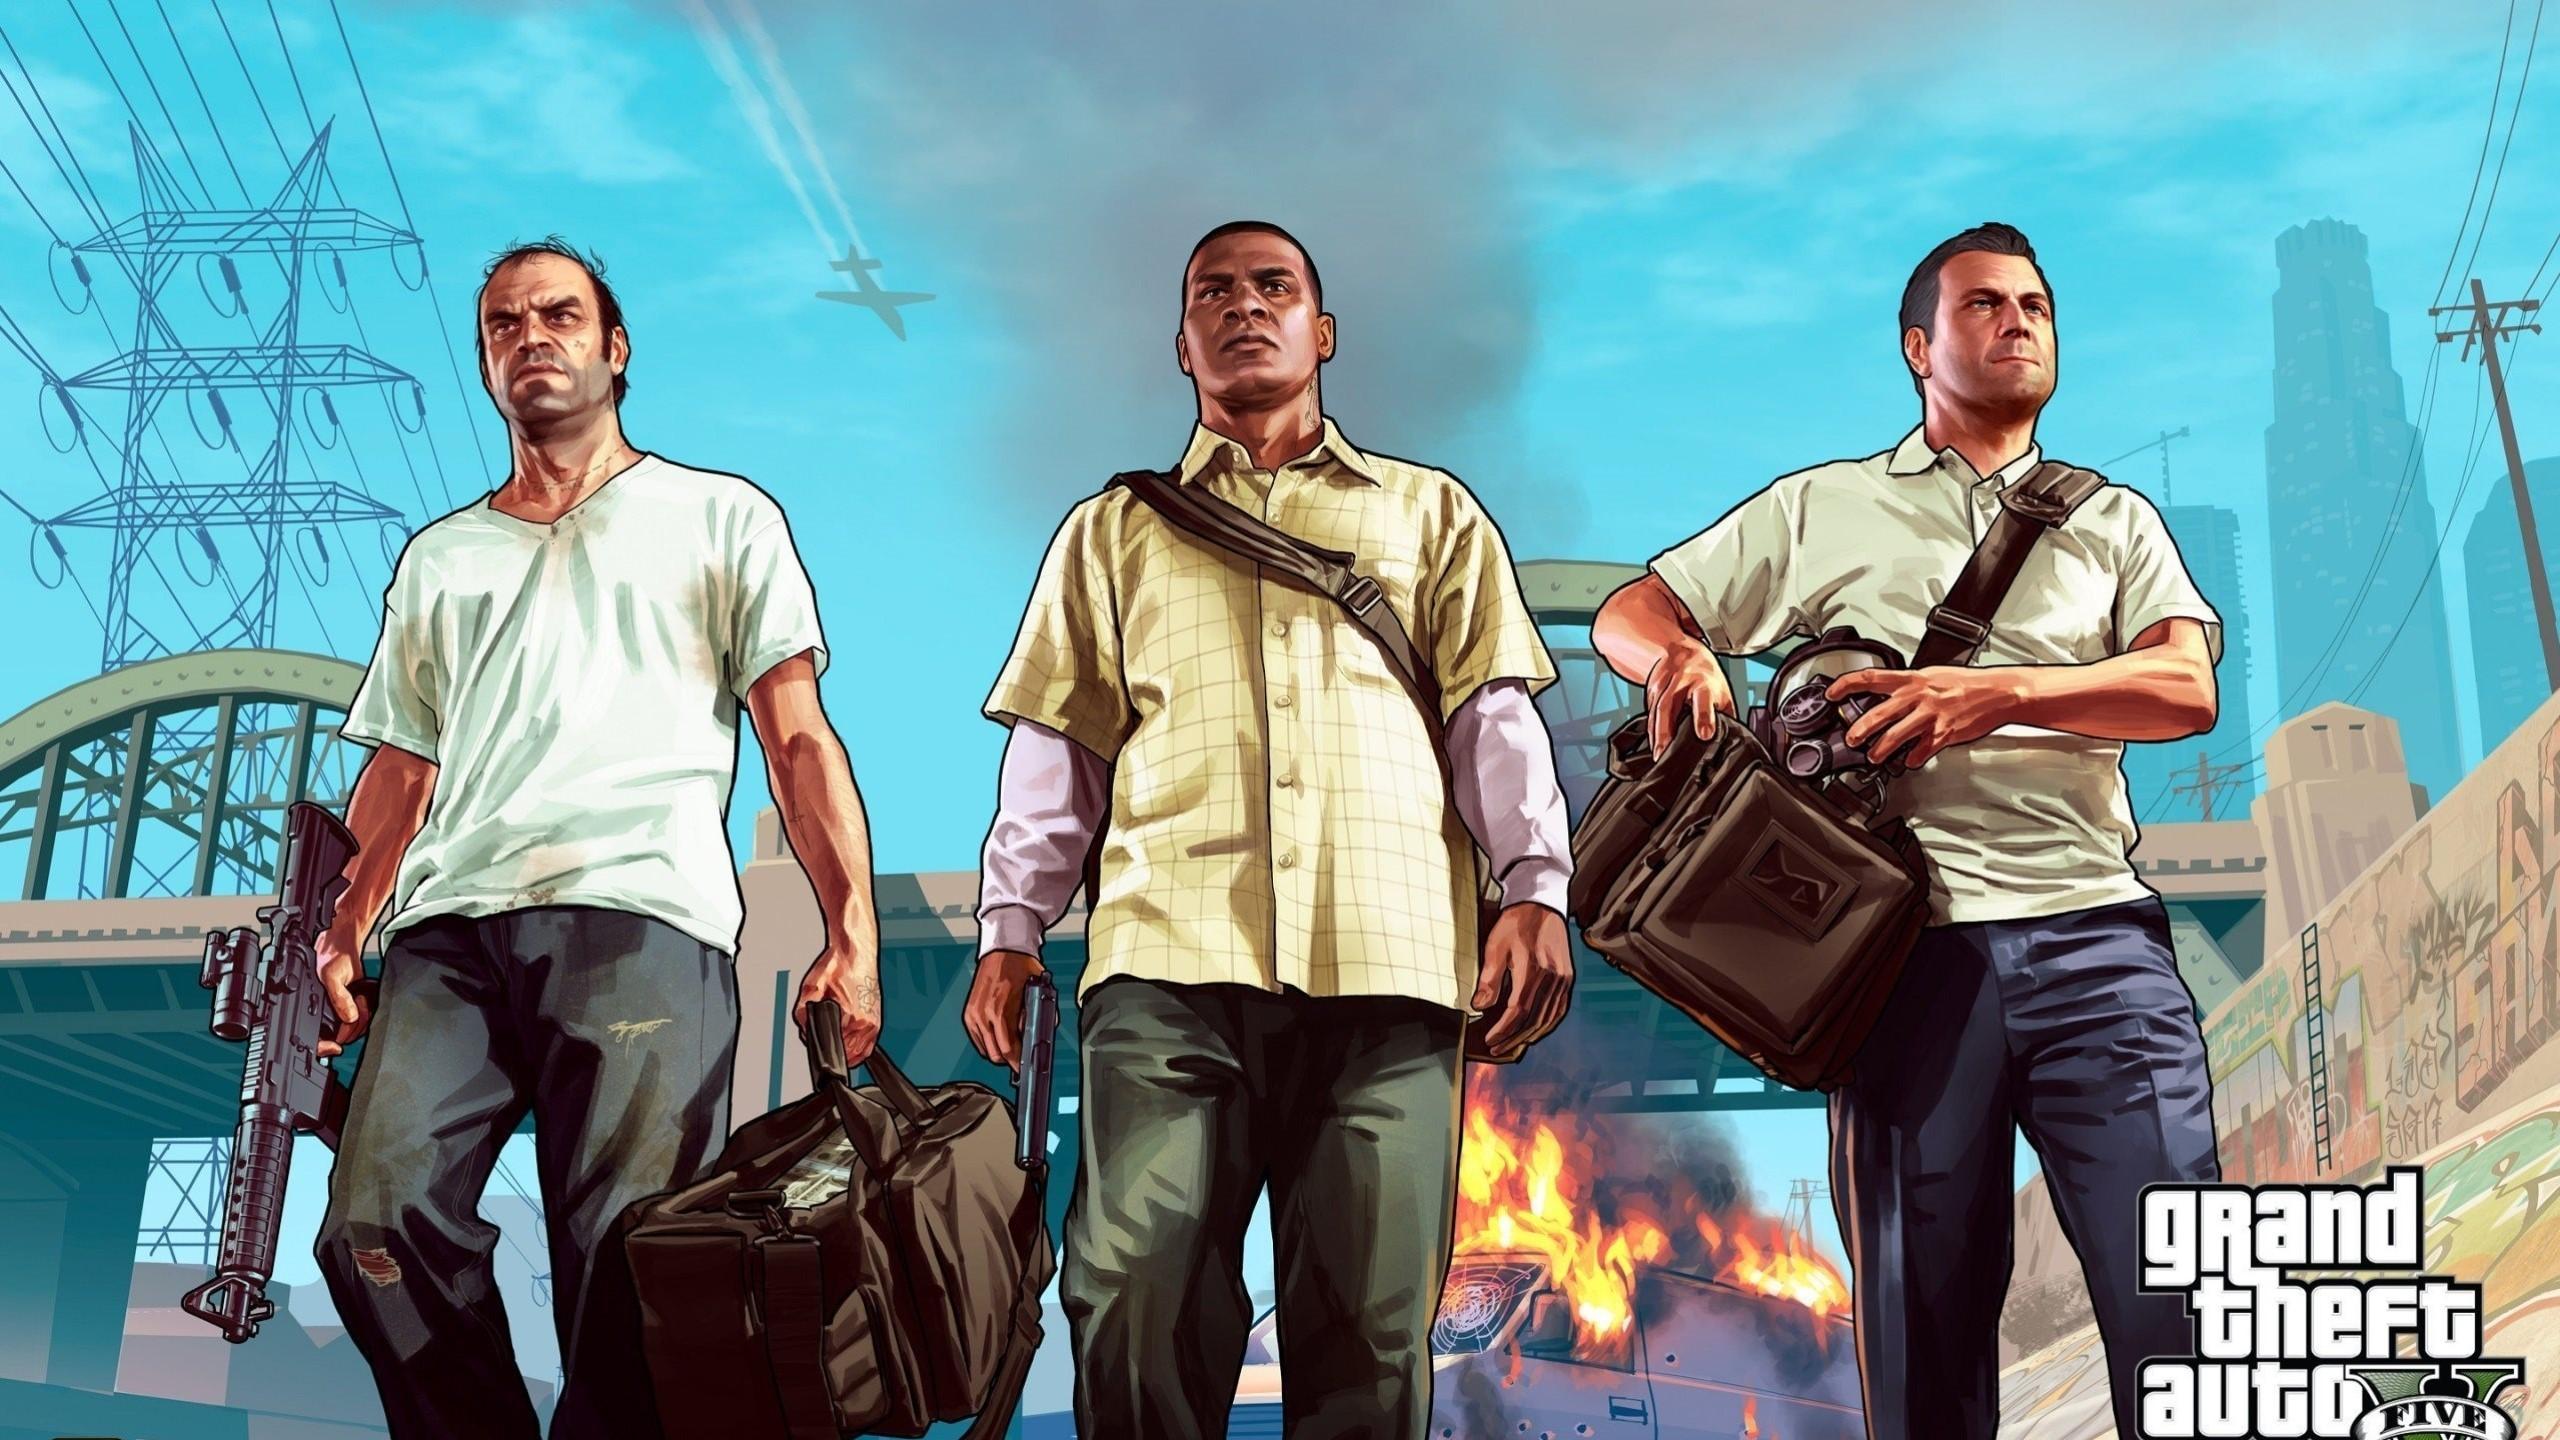 Grand Theft Auto V [Steam аккаунт] 100% Гарантия